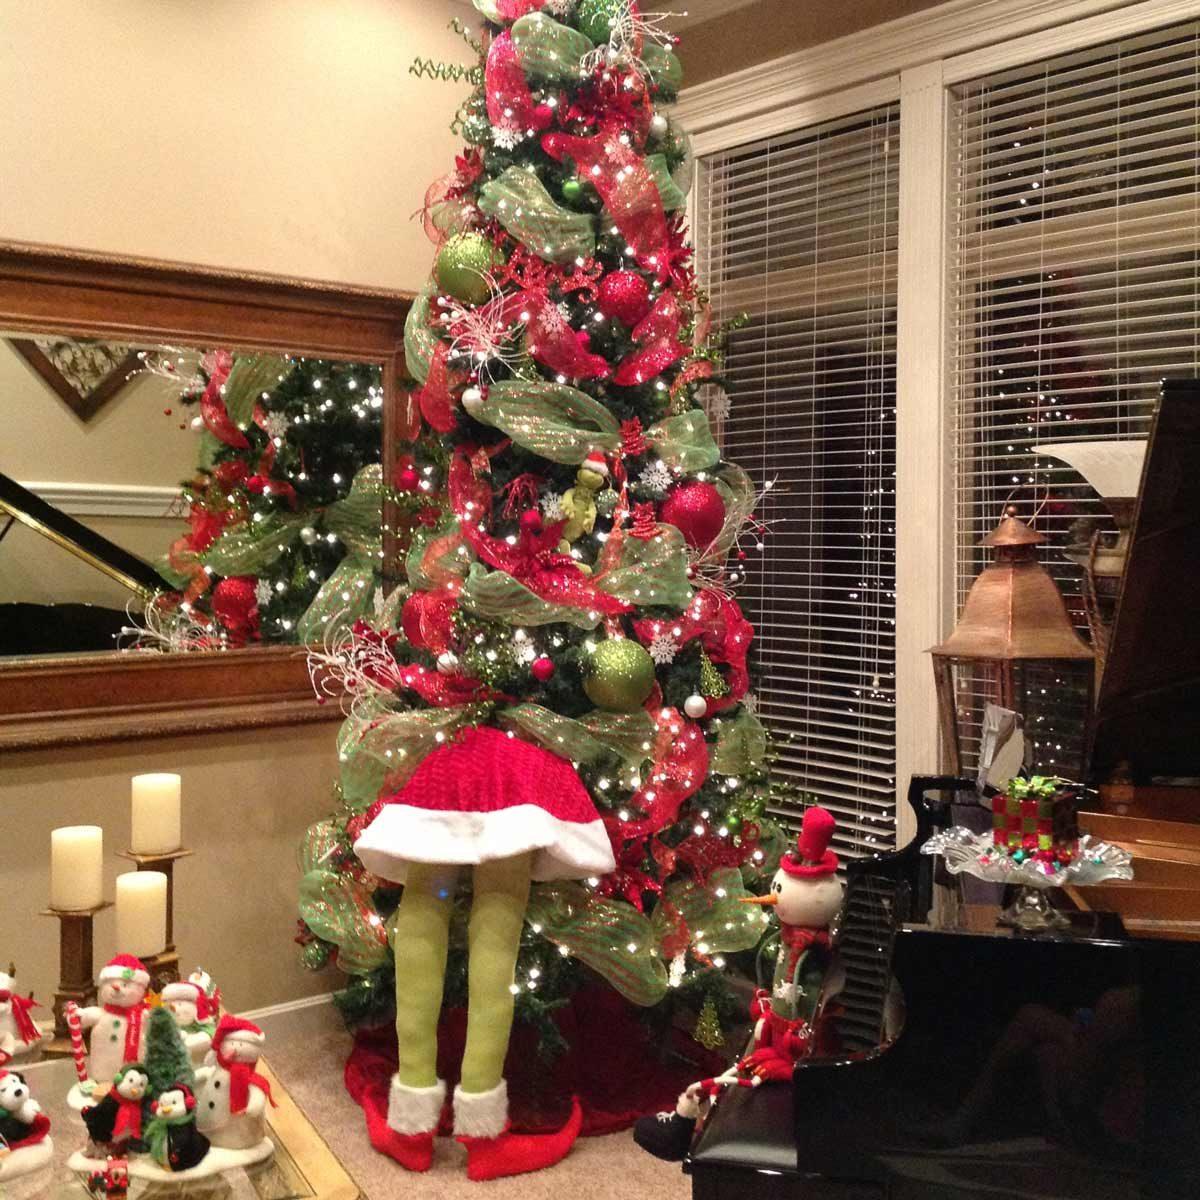 100 Incredible Christmas Tree Decorating Ideas The Family Handyman